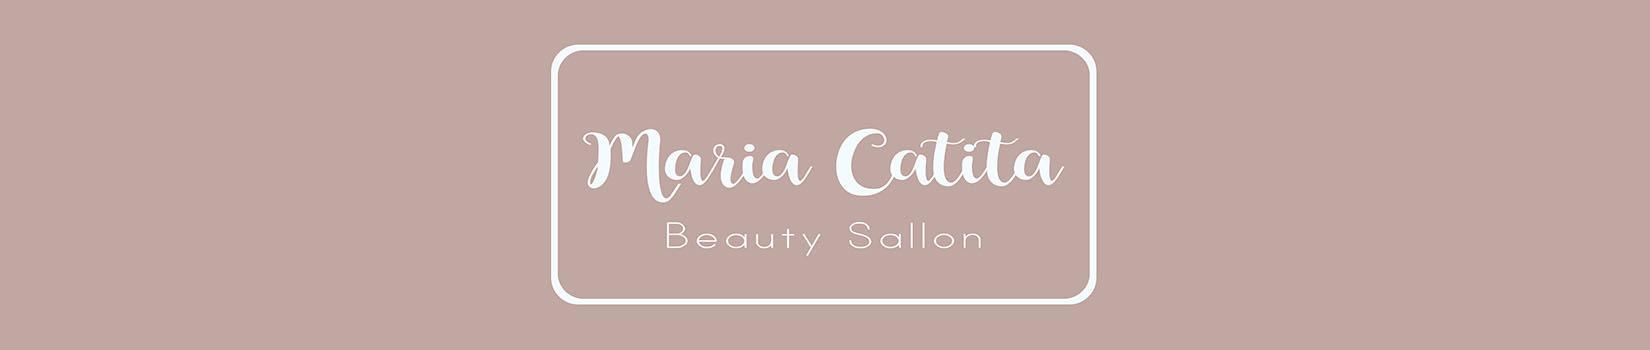 Maria Catita Beauty Sallon